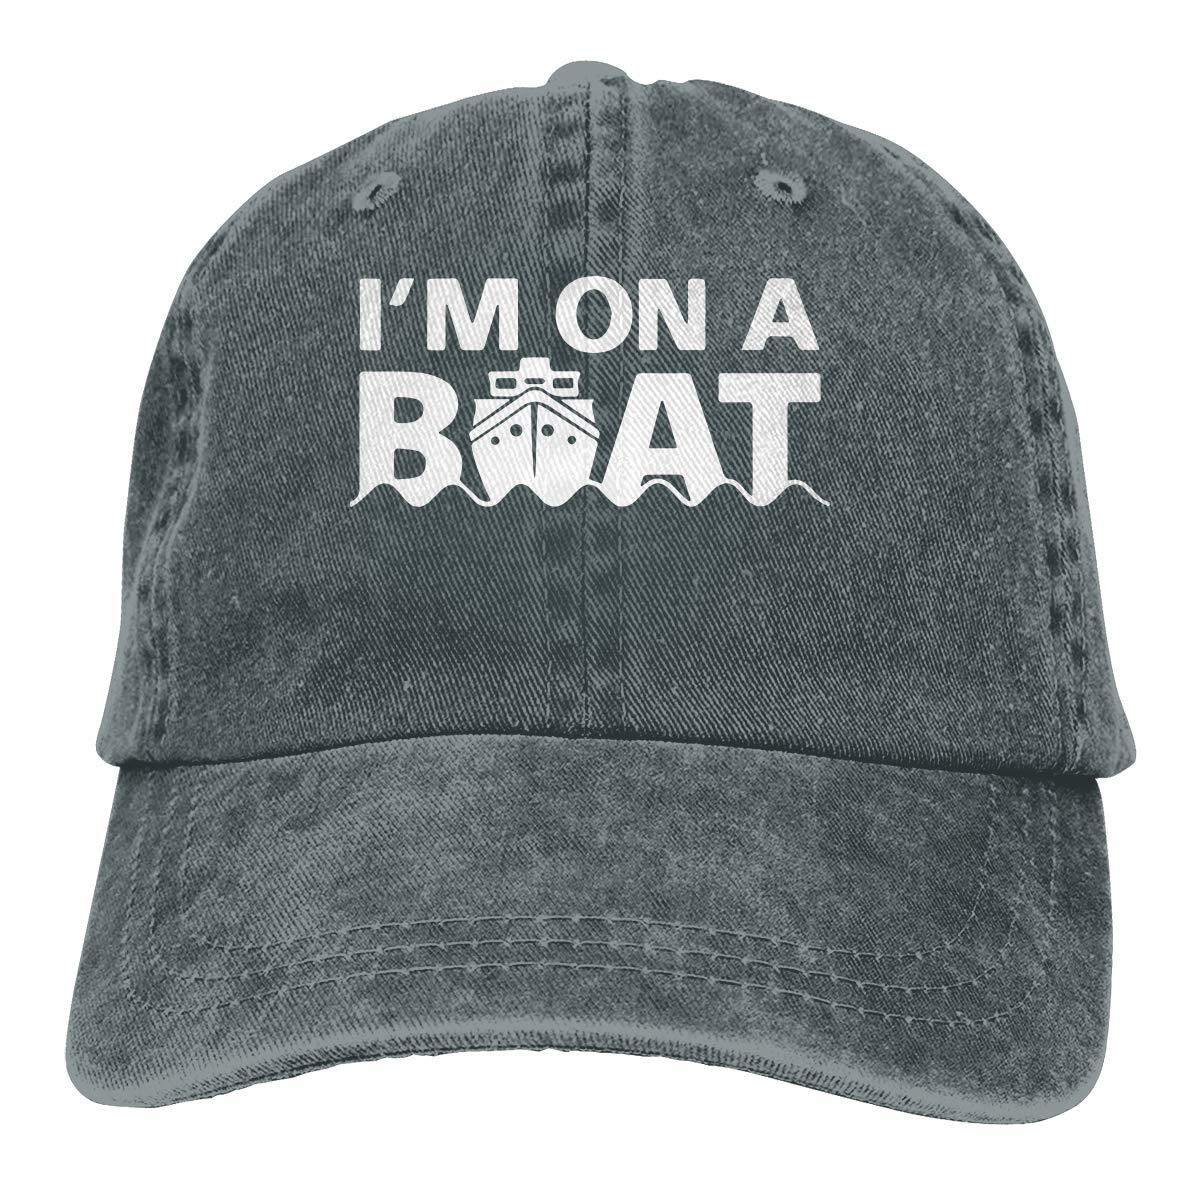 Im On A Boat Unisex Trendy Cowboy Outdoor Sports Hat Adjustable Baseball Cap